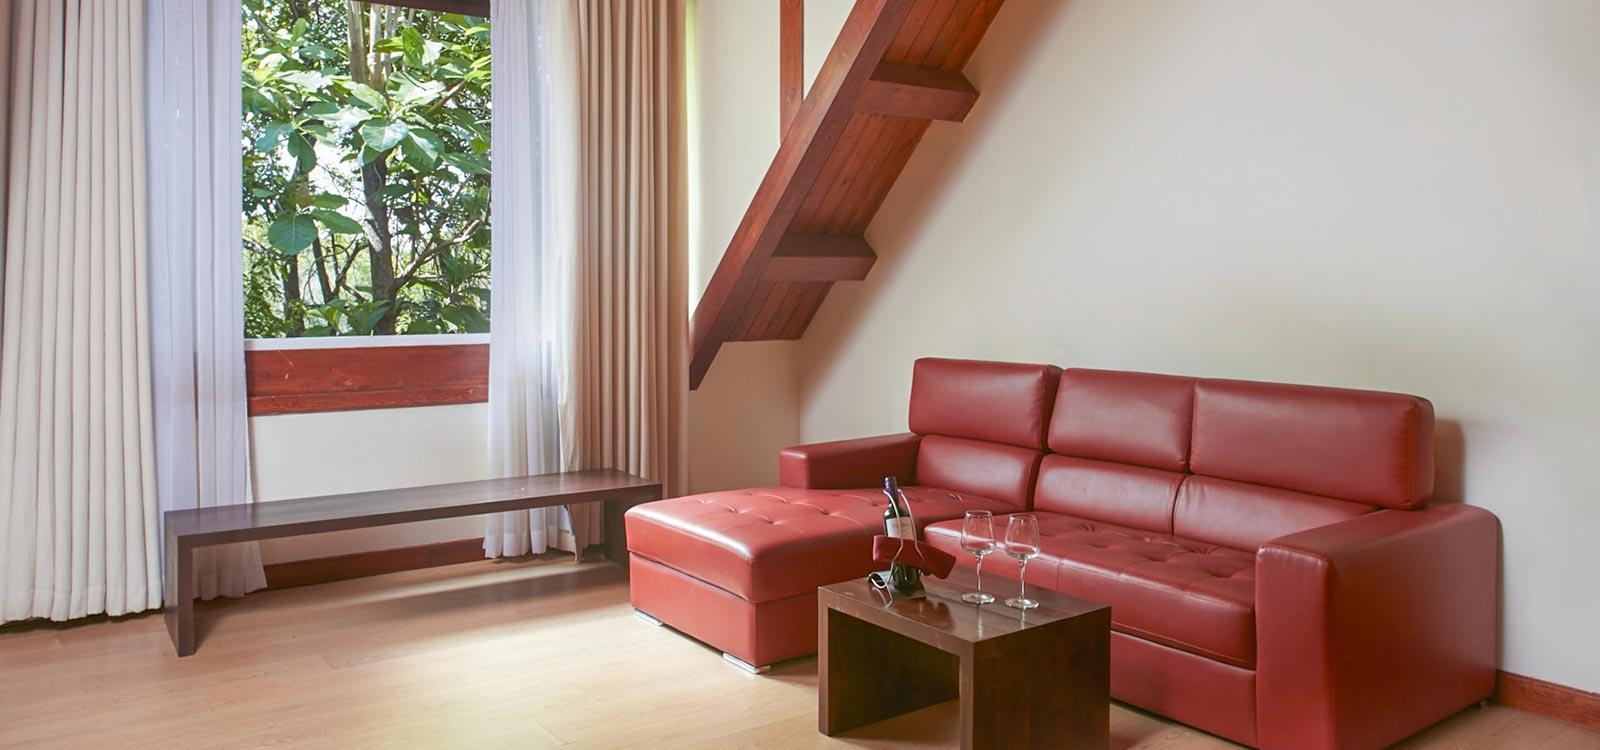 The Paradise duplex room